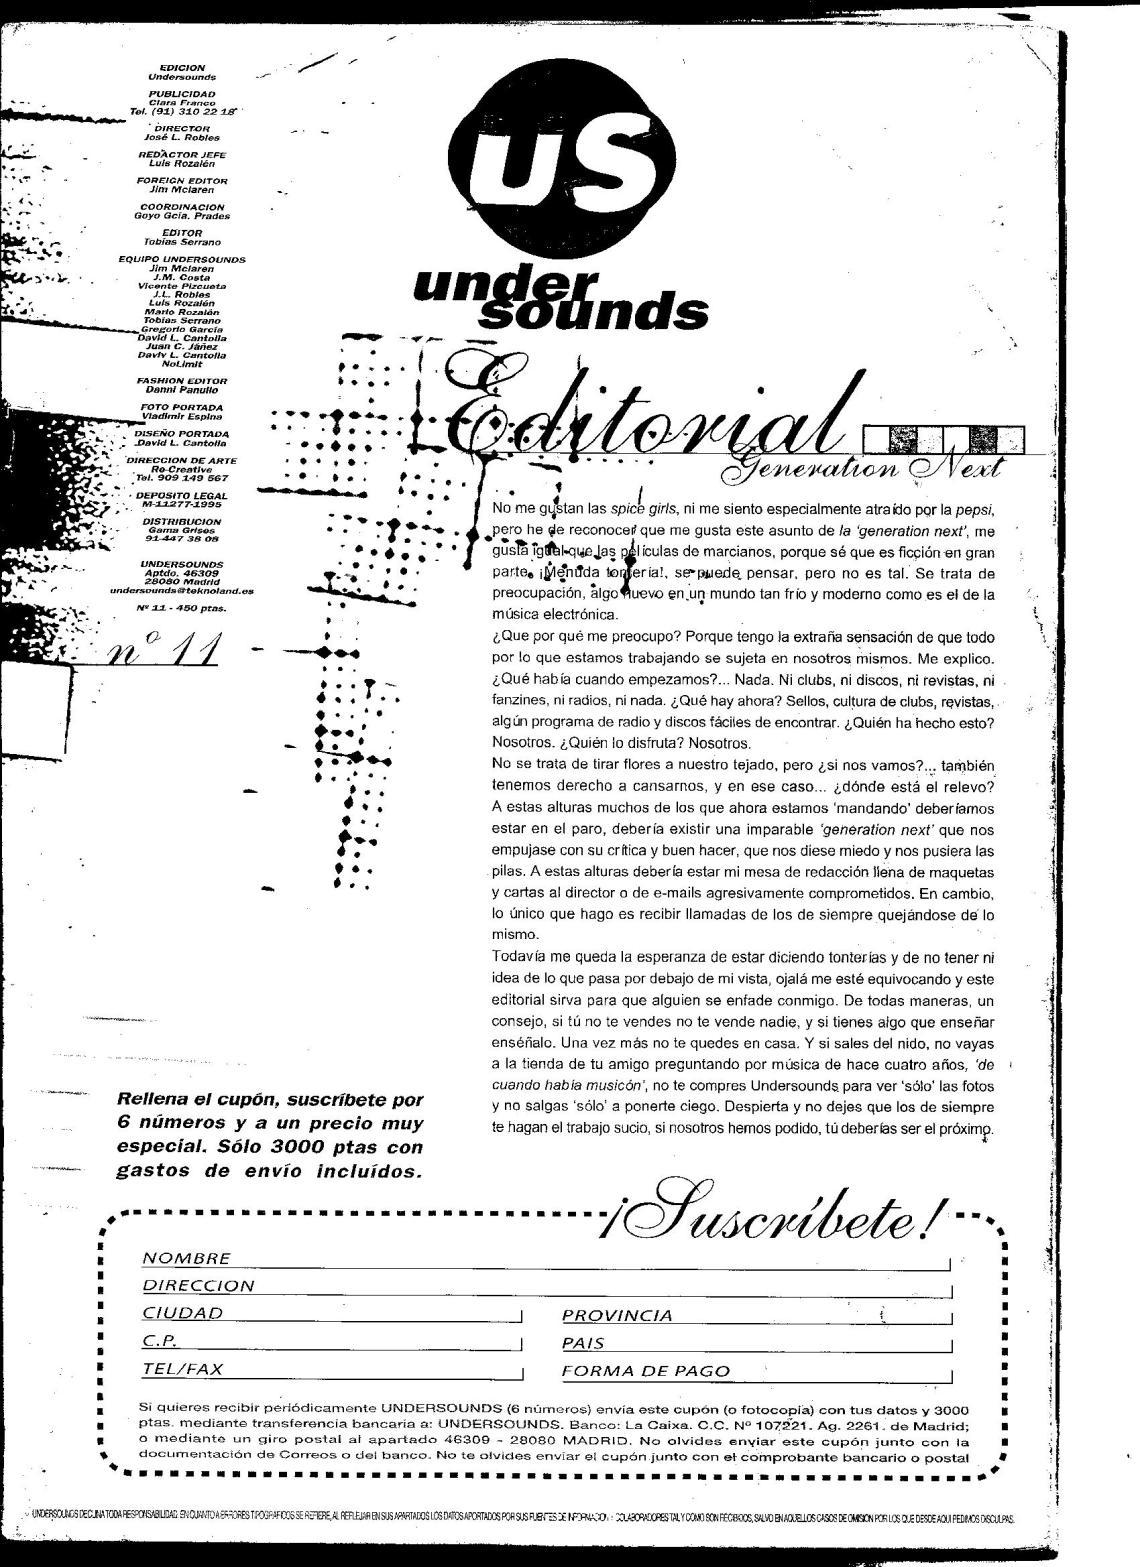 UNDERSOUNDS NO.11 1998 COMPLETA EN PDF